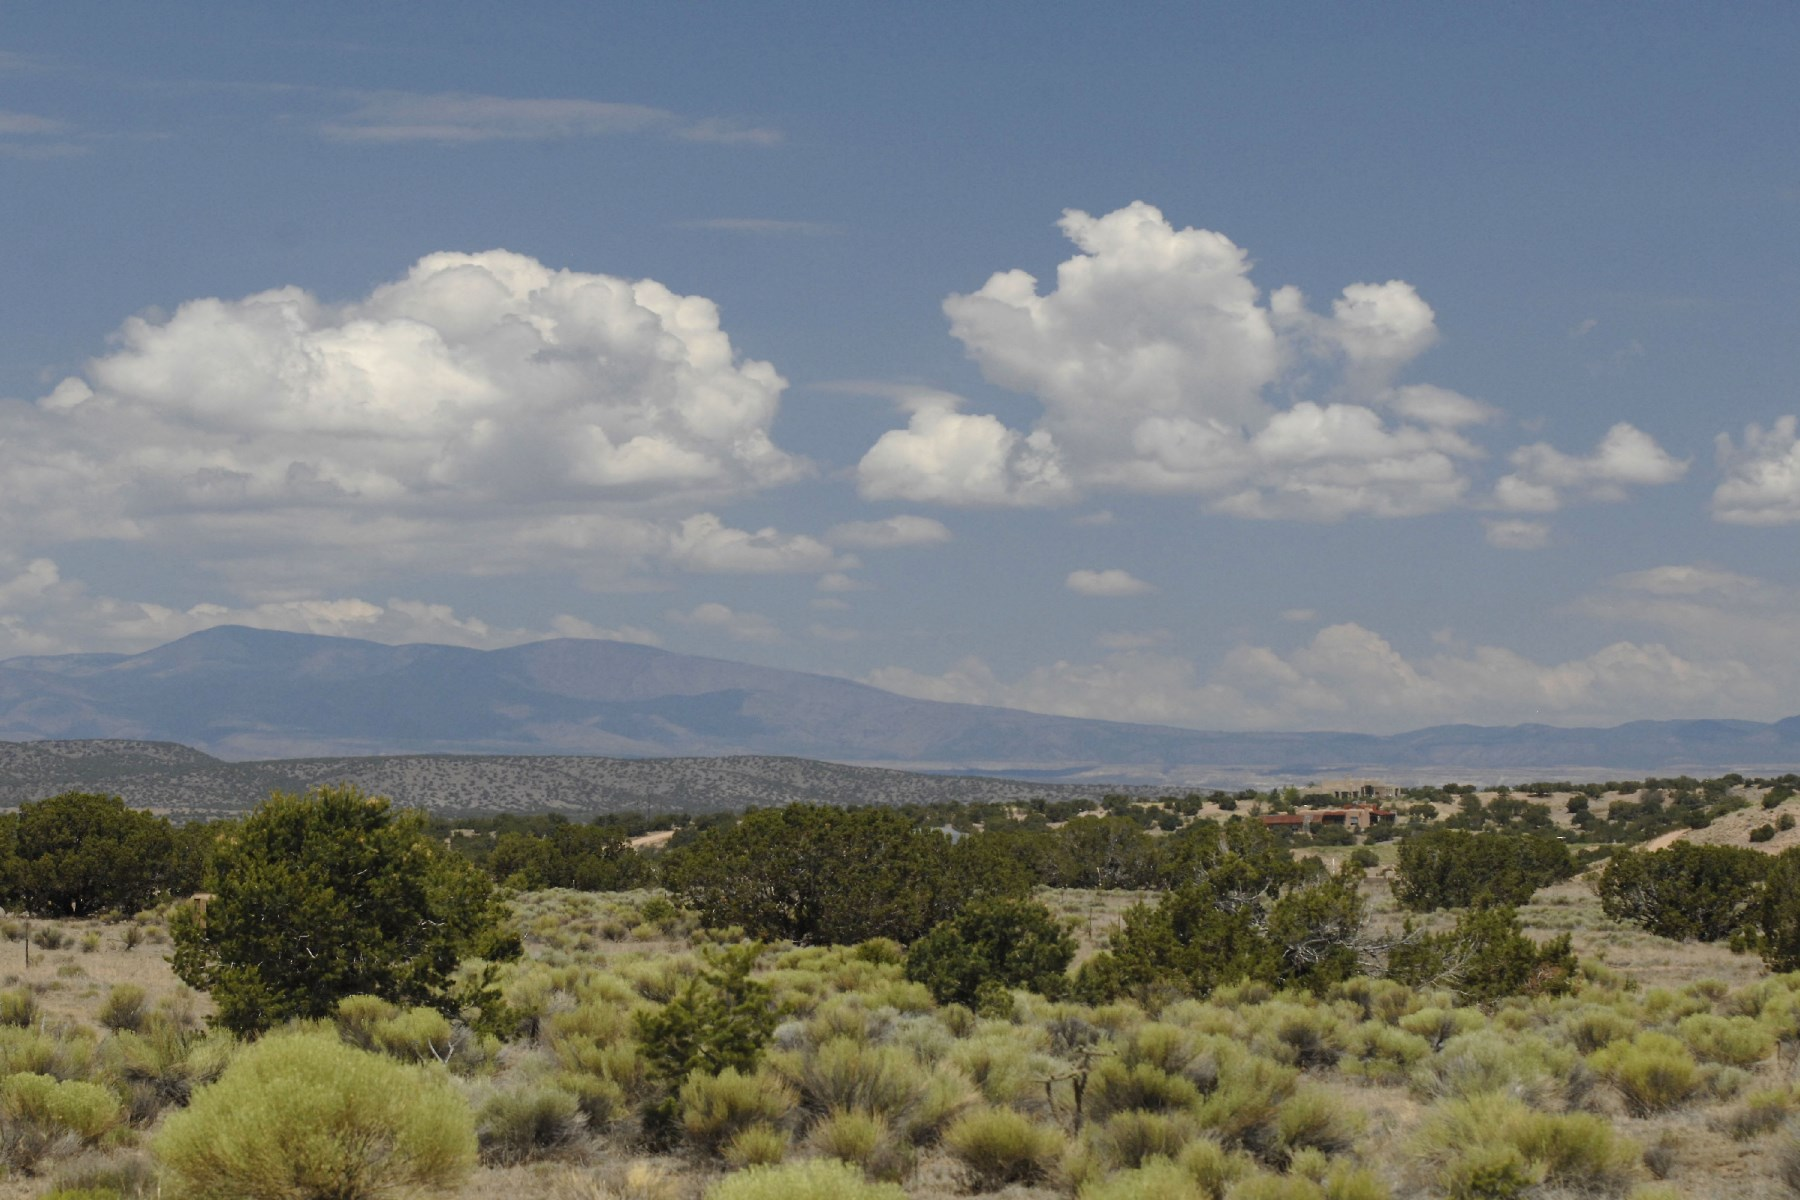 Land for Sale at 151 Paseo Aragon, #64 Las Campanas & Los Santeros, Santa Fe, New Mexico 87506 United States